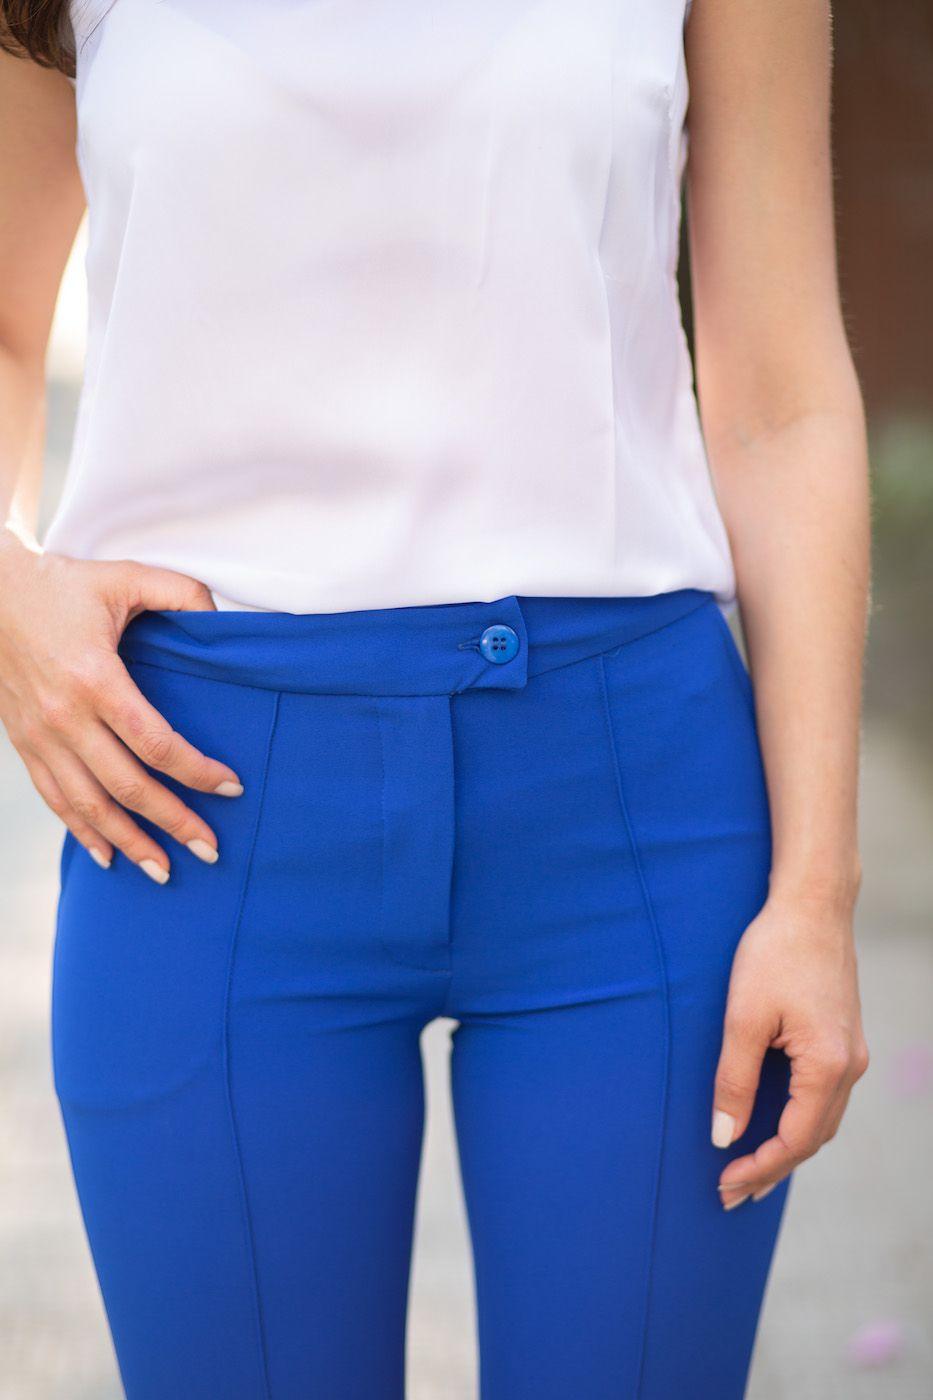 Calça Social Feminina Alfaiataria Azul Bic